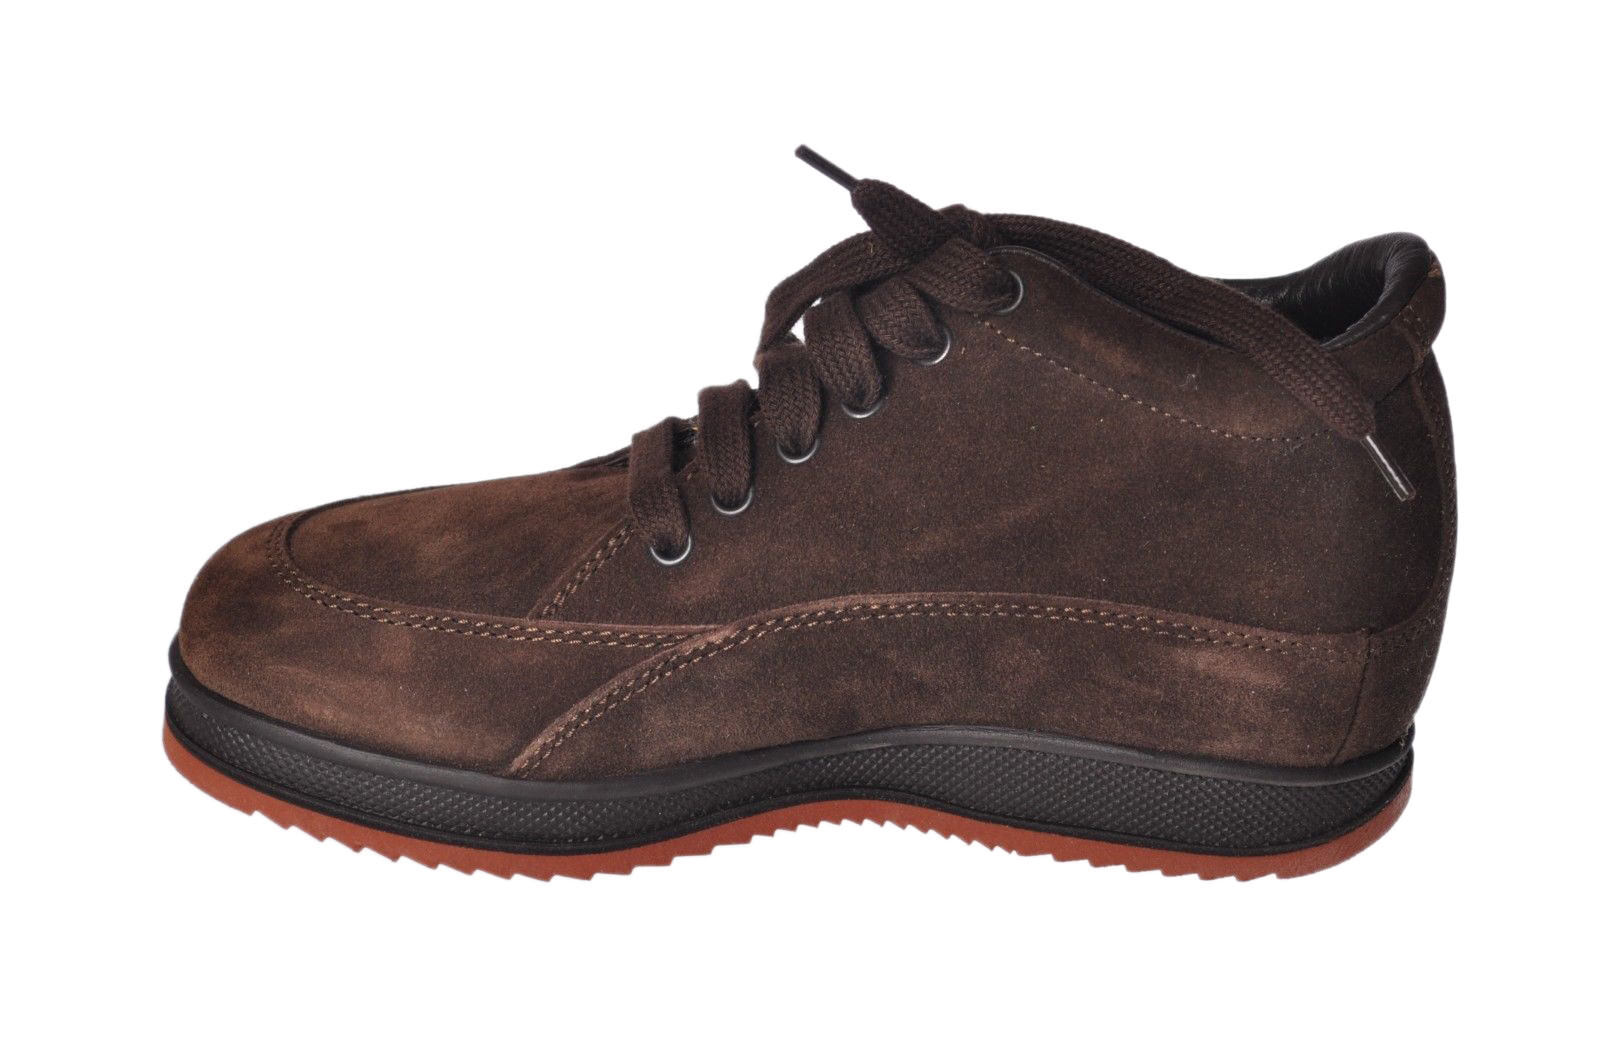 Barleycorn-Zapatos-Tenis-Mujer 514552-0C183729 - Marrón - 514552-0C183729 Barleycorn-Zapatos-Tenis-Mujer f91871